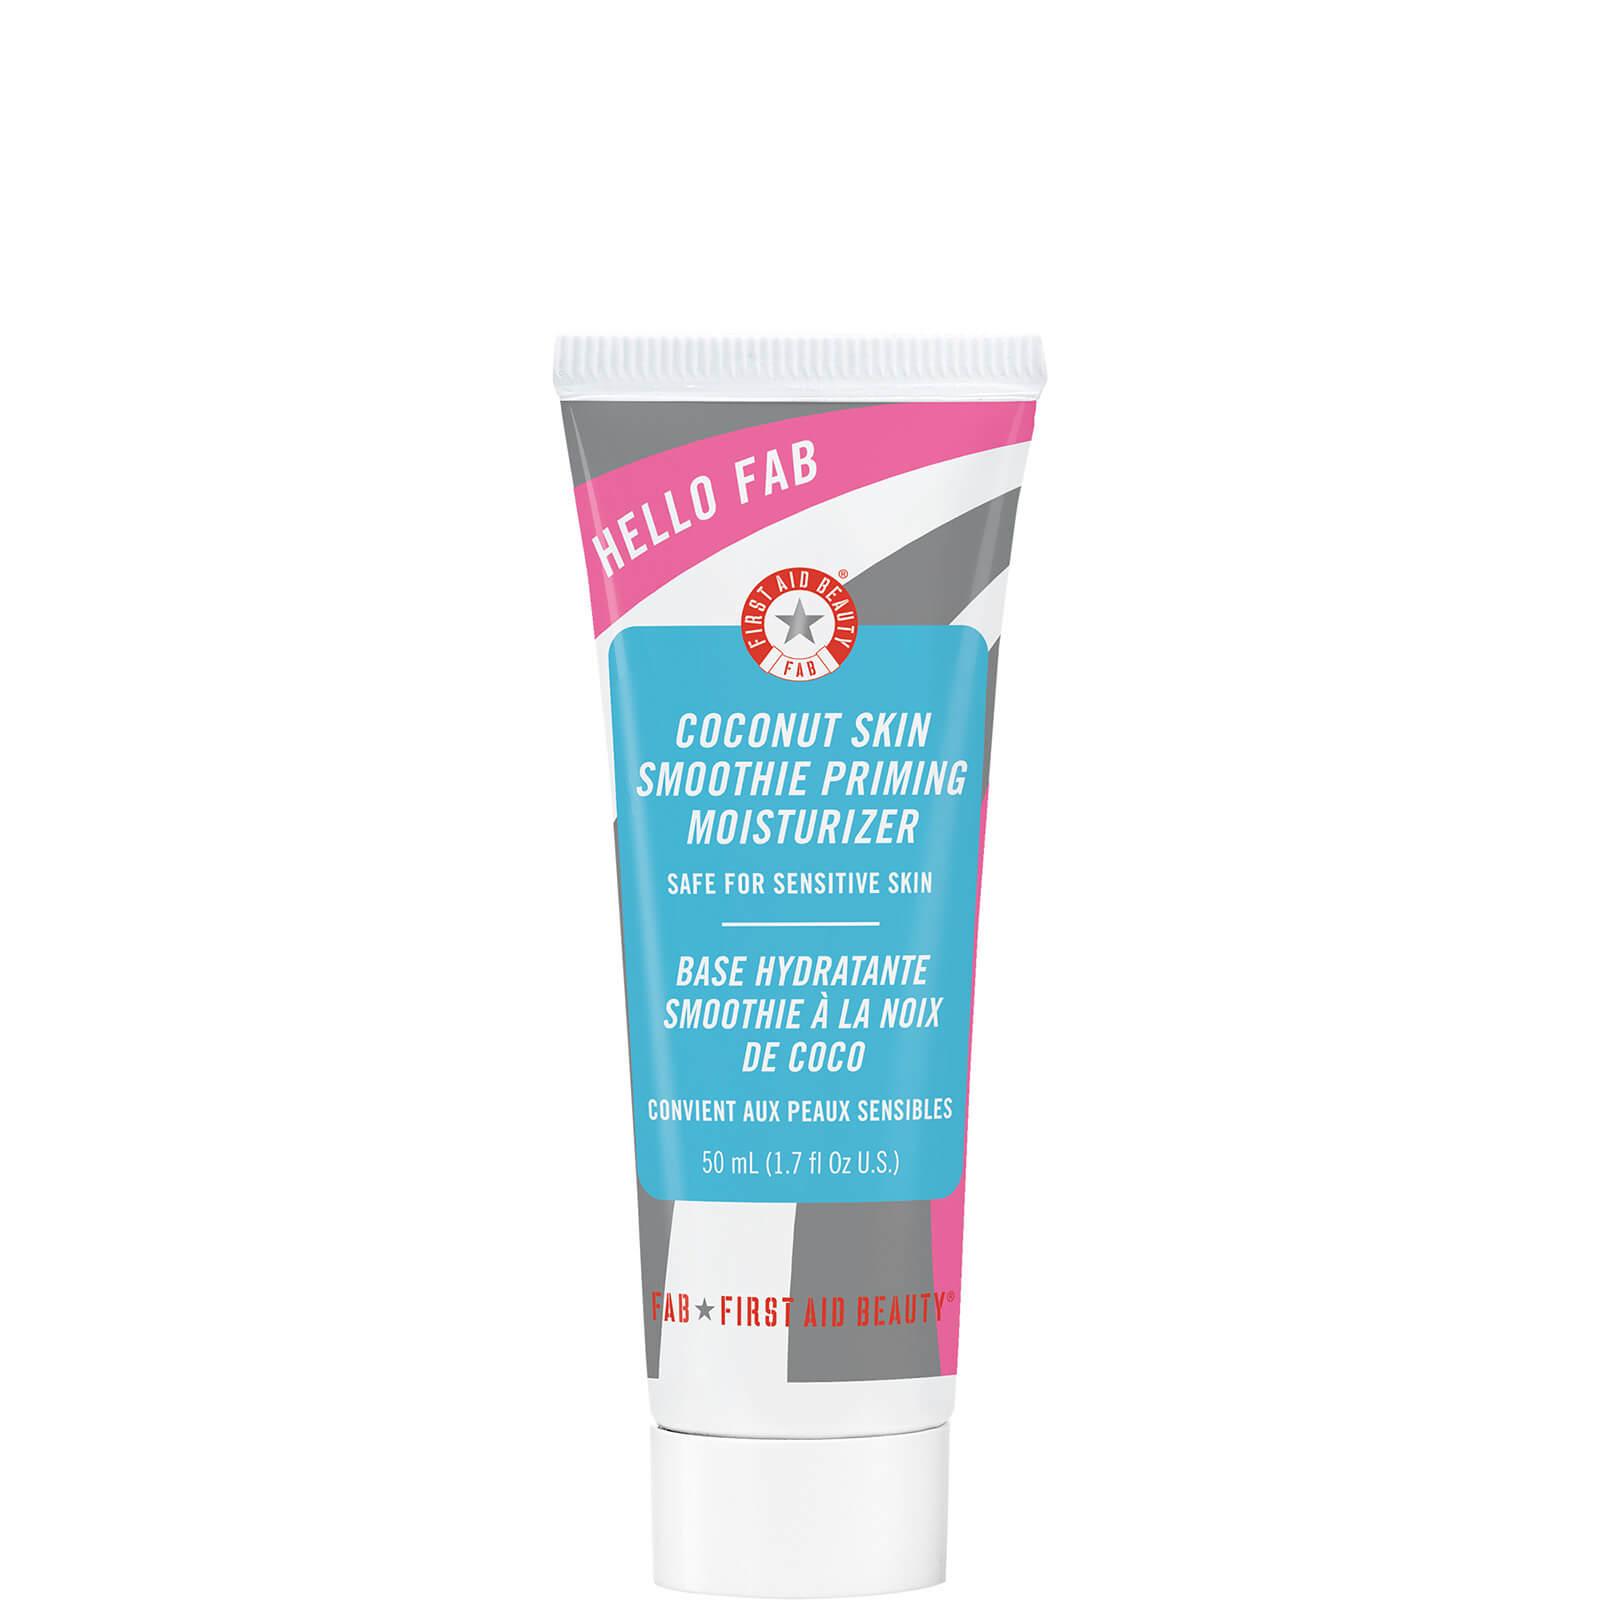 Купить First Aid Beauty Coconut Skin Smoothie Priming Moisturizer